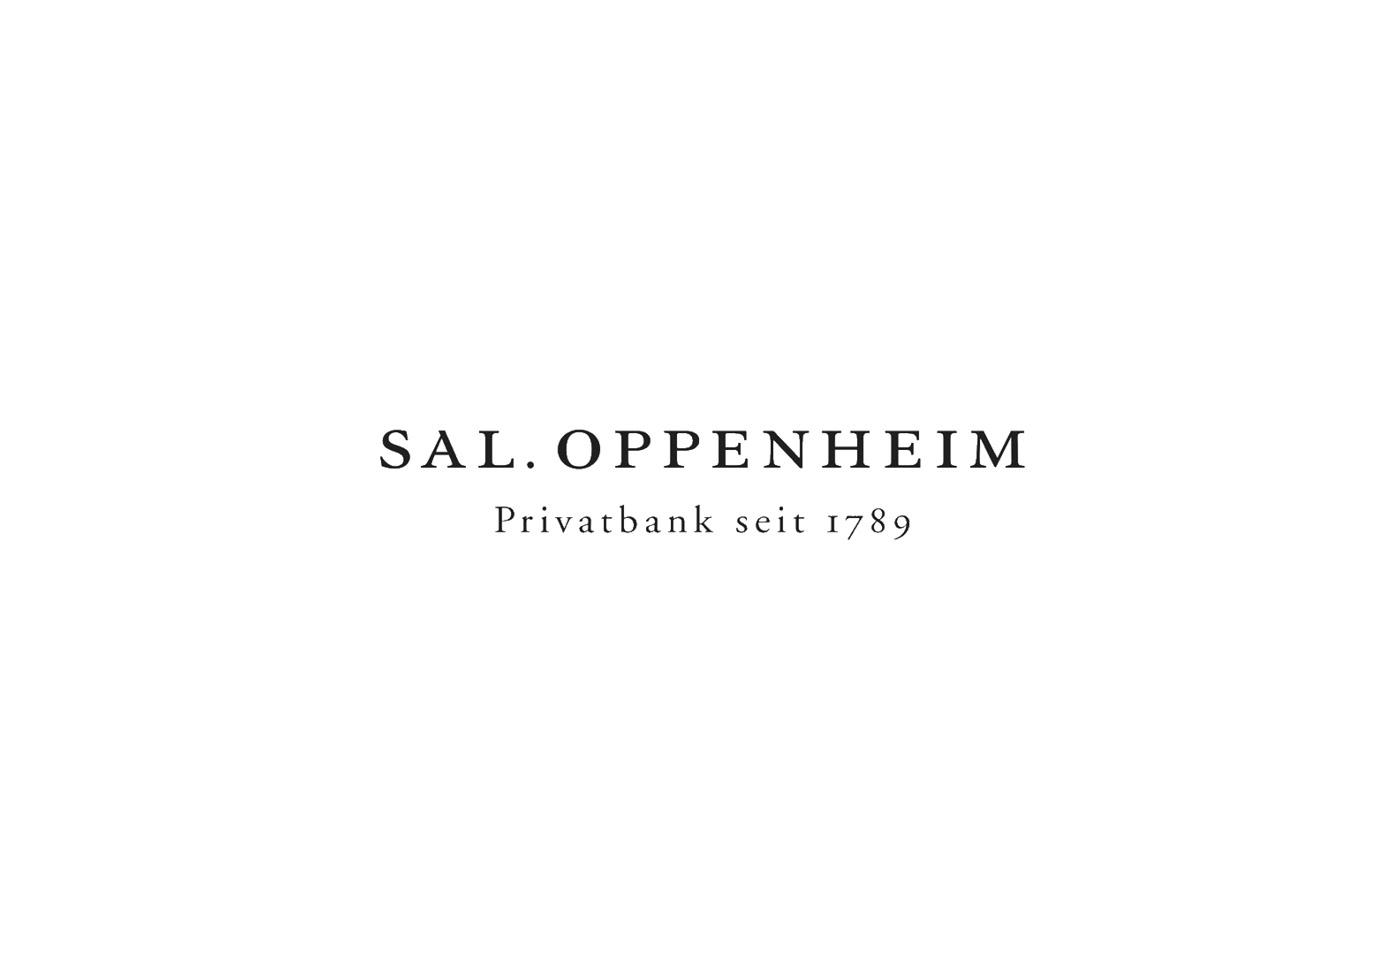 Sal Oppenheim